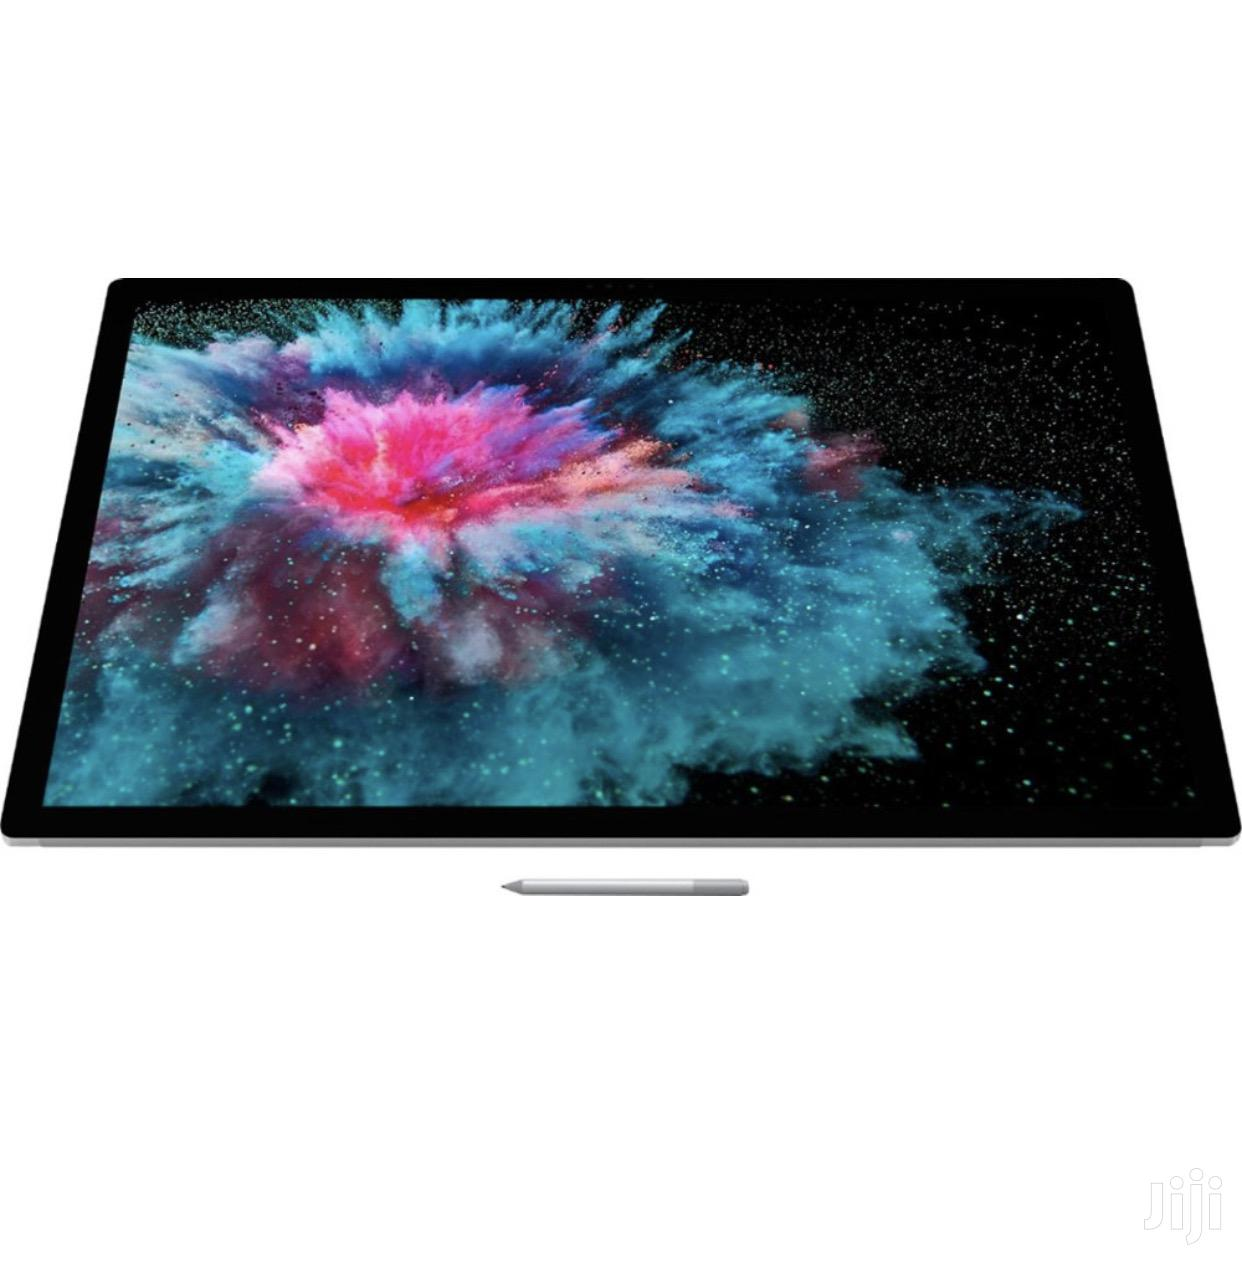 New Desktop Computer Laptop 16GB Intel Core i7 SSD 1T